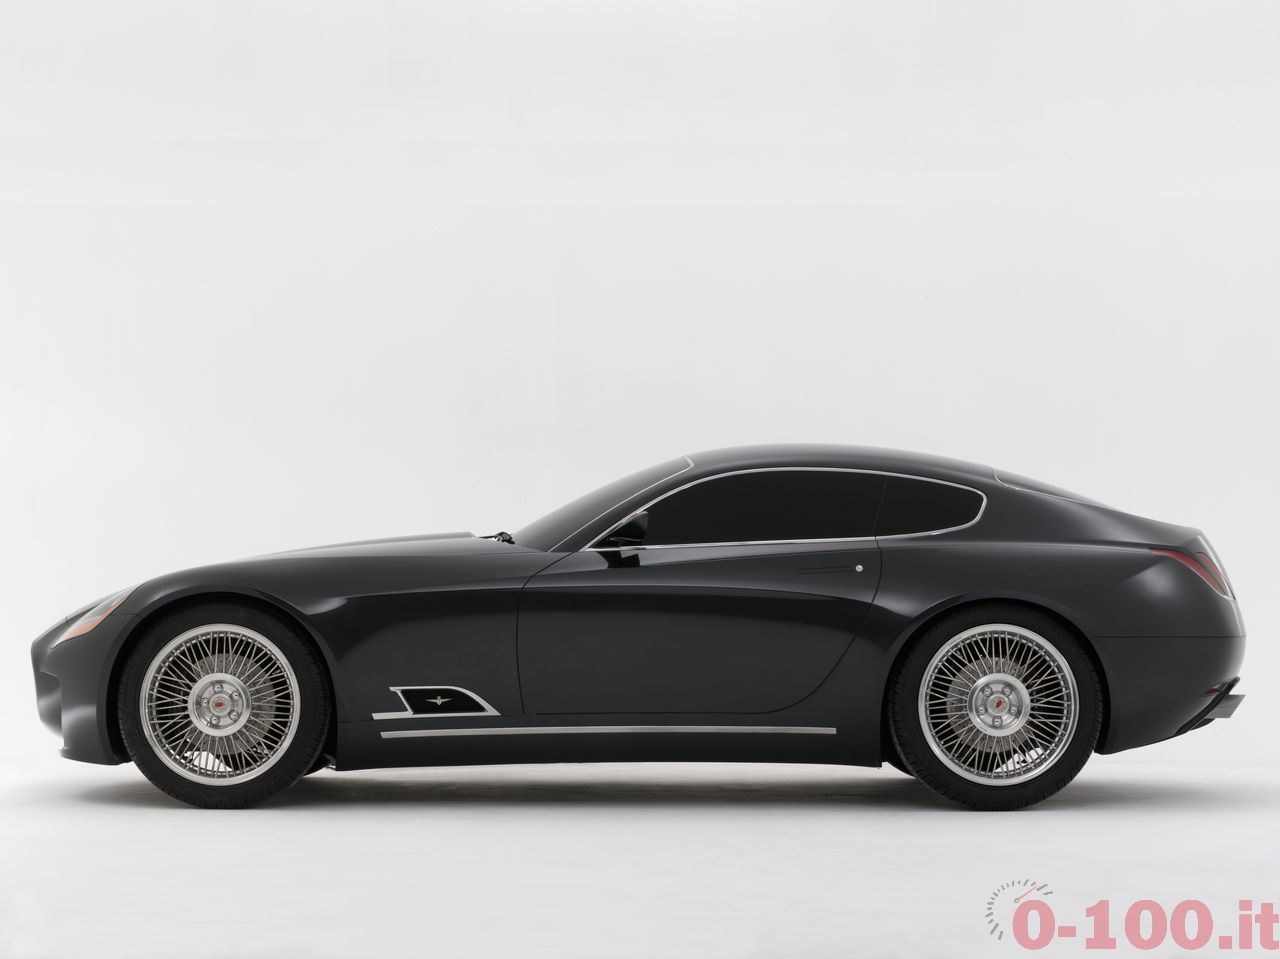 maserati-a8-gcs-touring-superleggera-carrozzeria-0-100_4